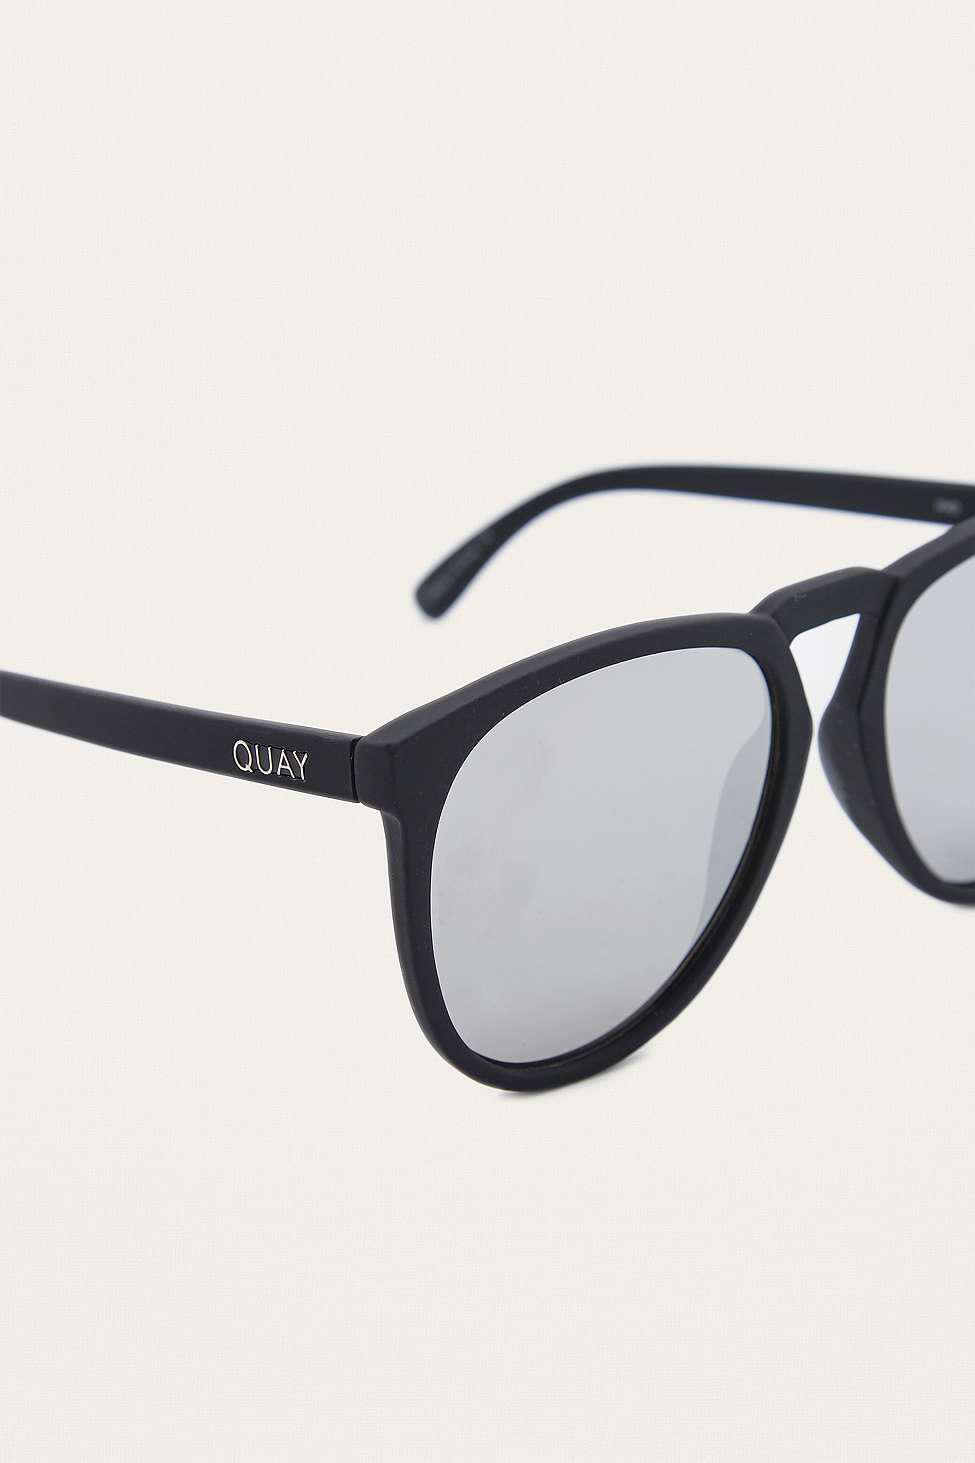 Quay Phd Silver Lens Sunglasses in Black for Men